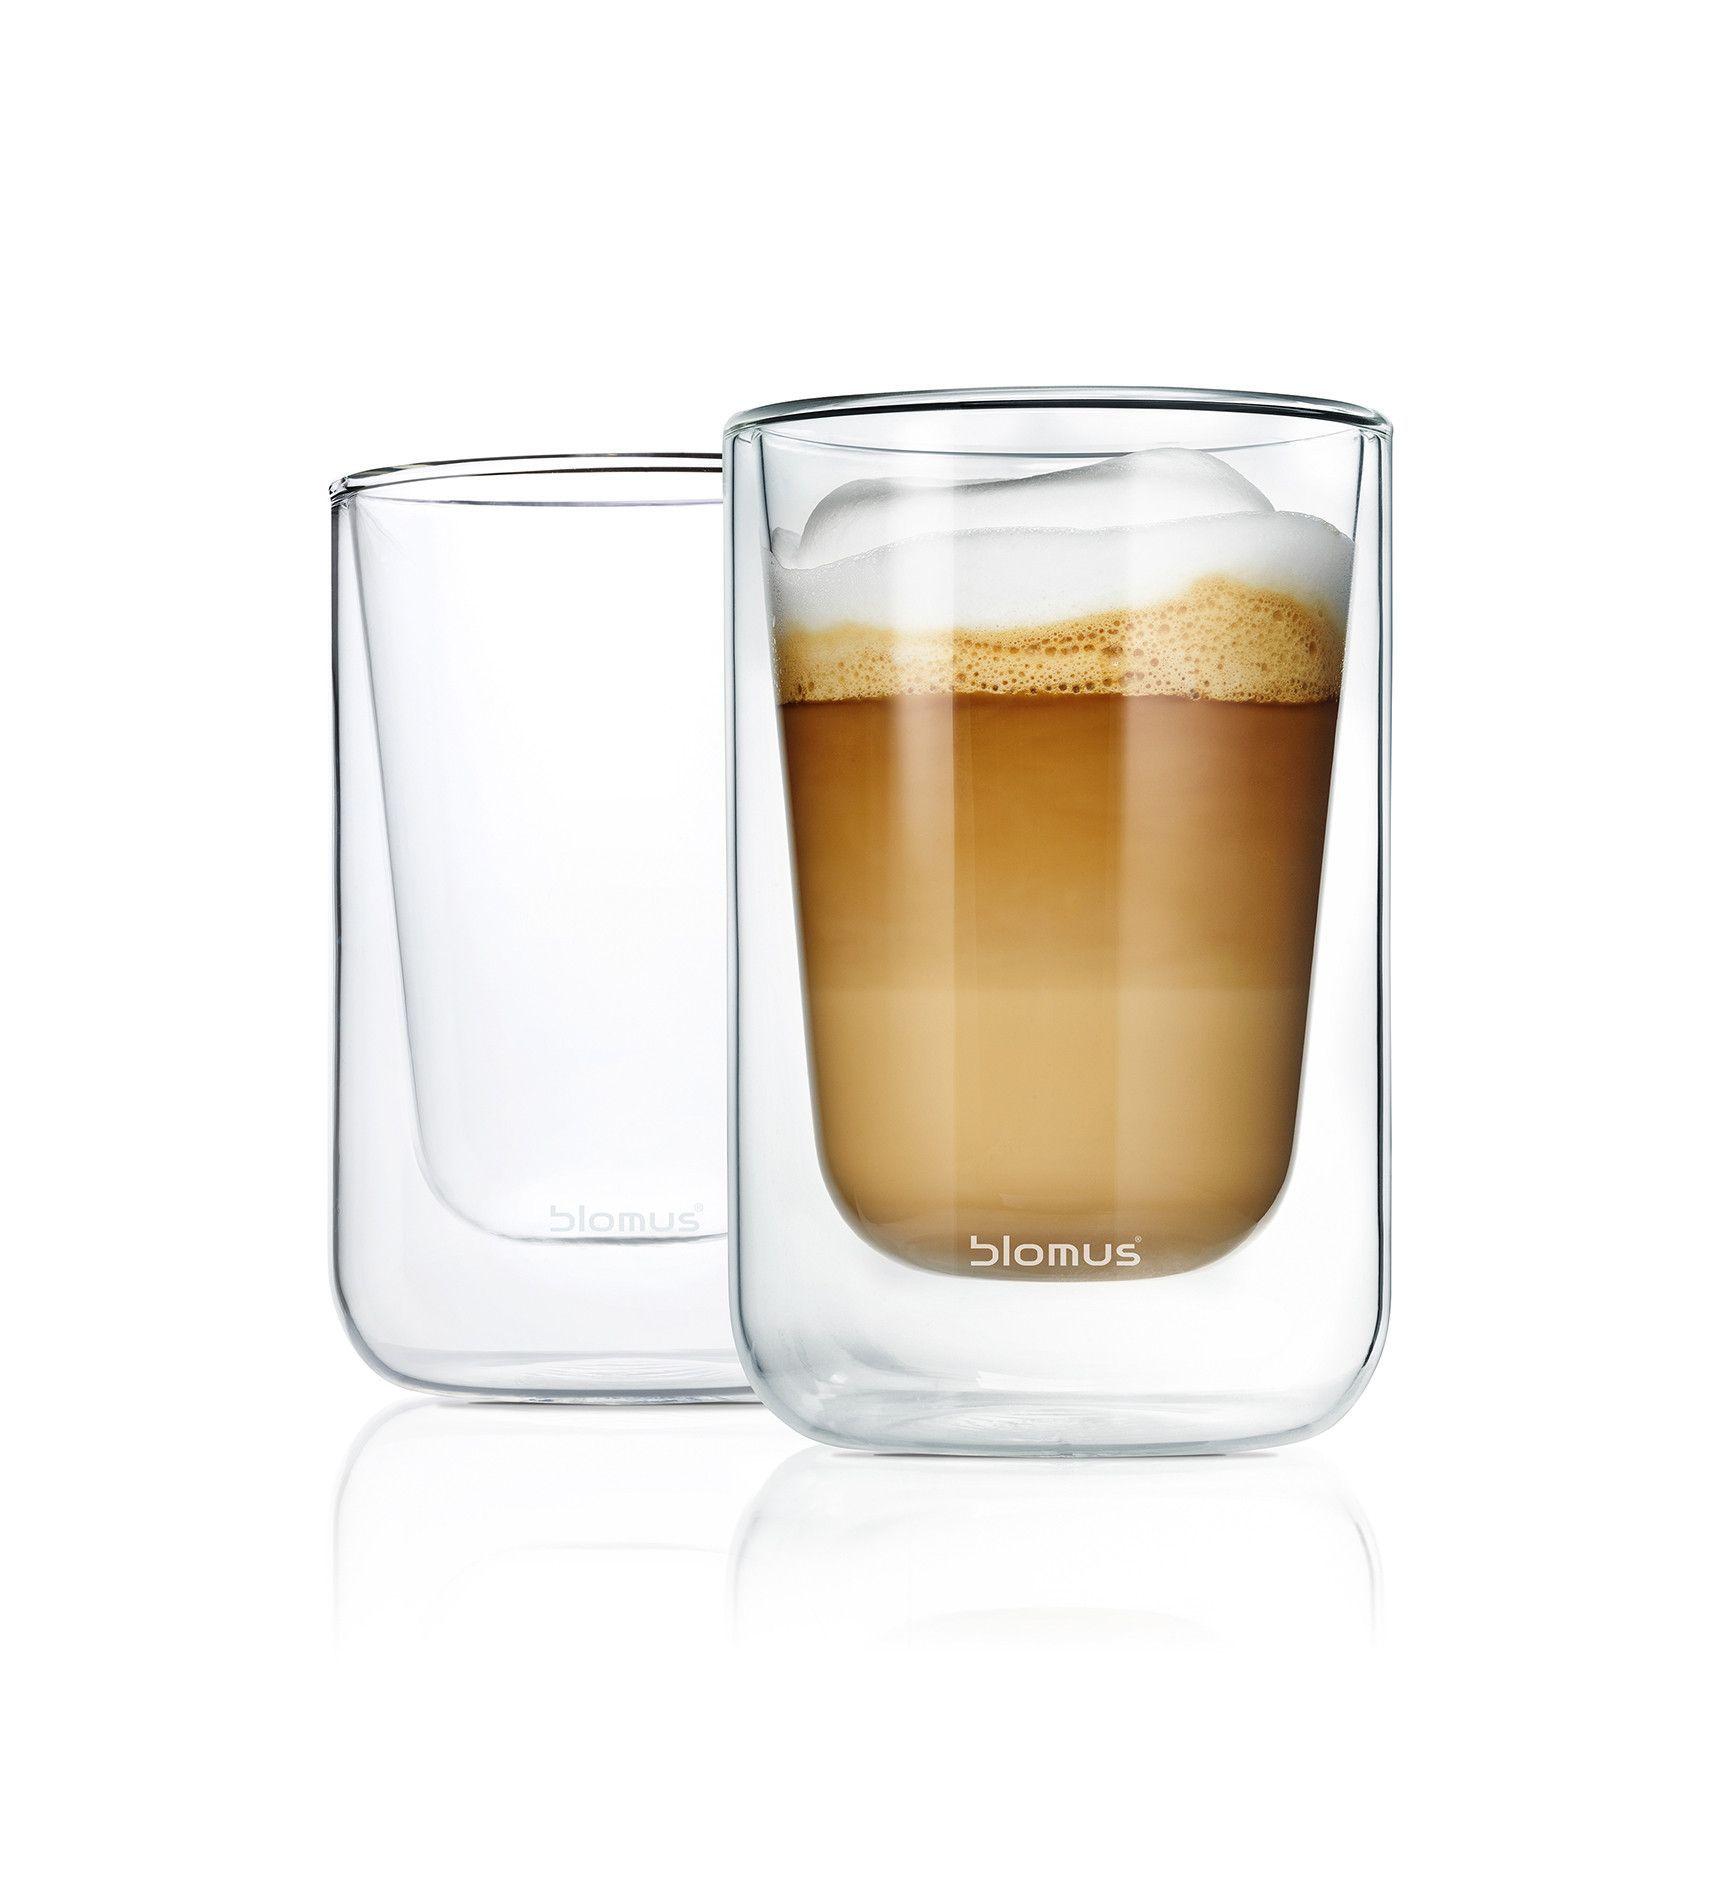 Nero Set 2 Cappuccino / Tea Glasses (Set of 2)